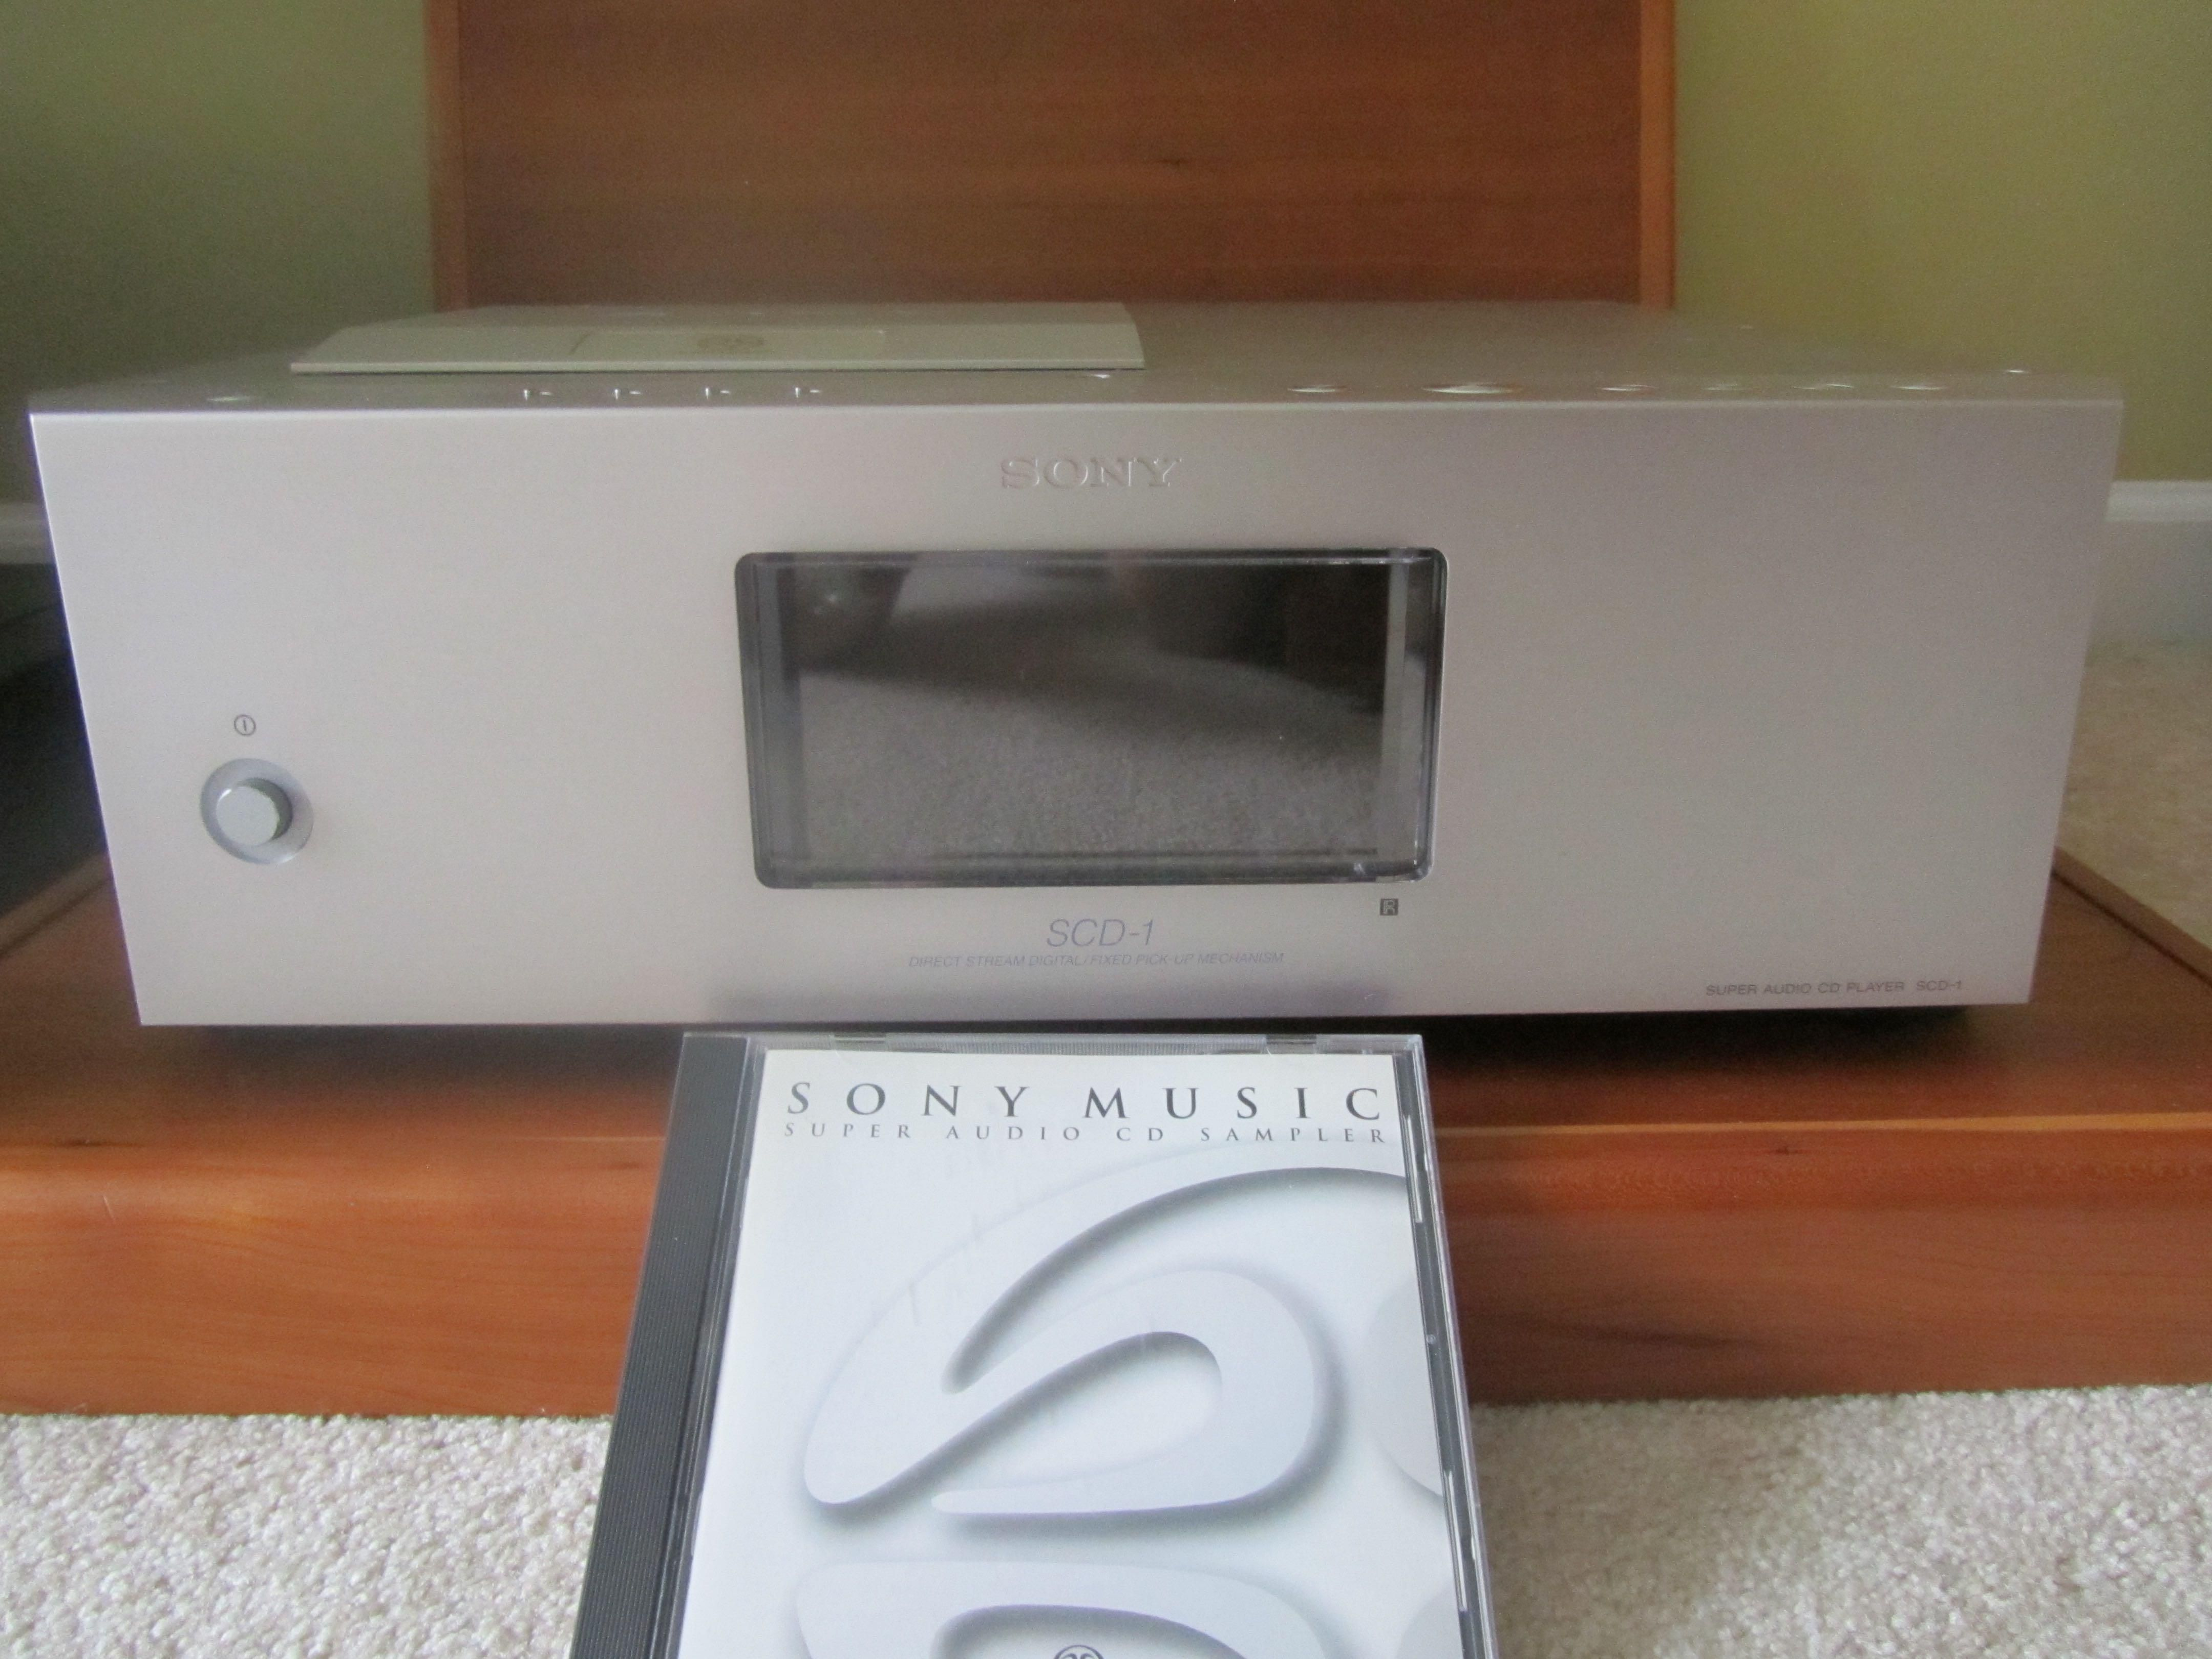 Scd-1 | Stereo beauty | Sony, Hifi stereo, High end audio